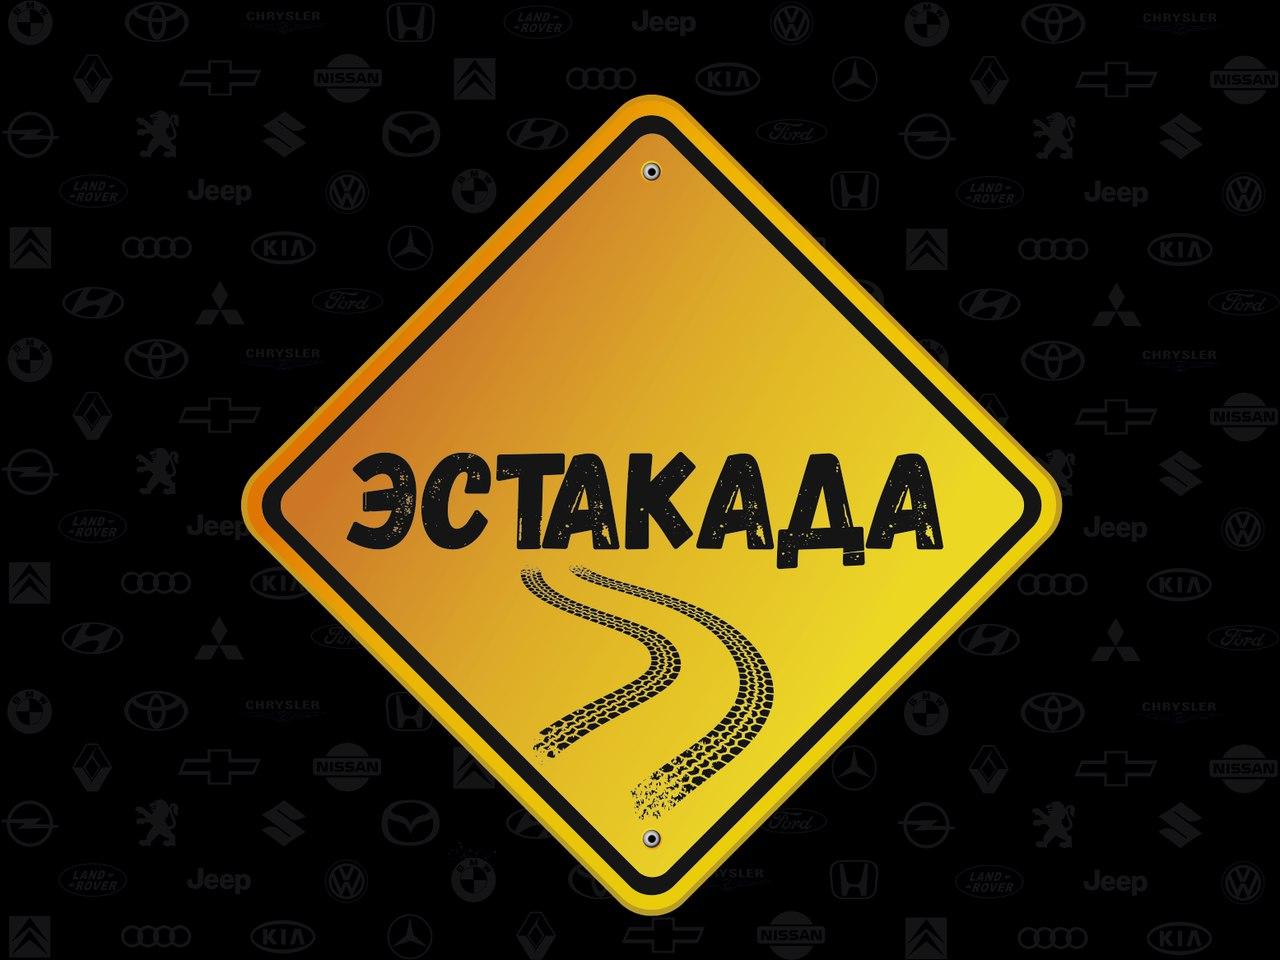 pp.vk.me/c630322/v630322274/44a5c/etk6jVmaPK8.jpg